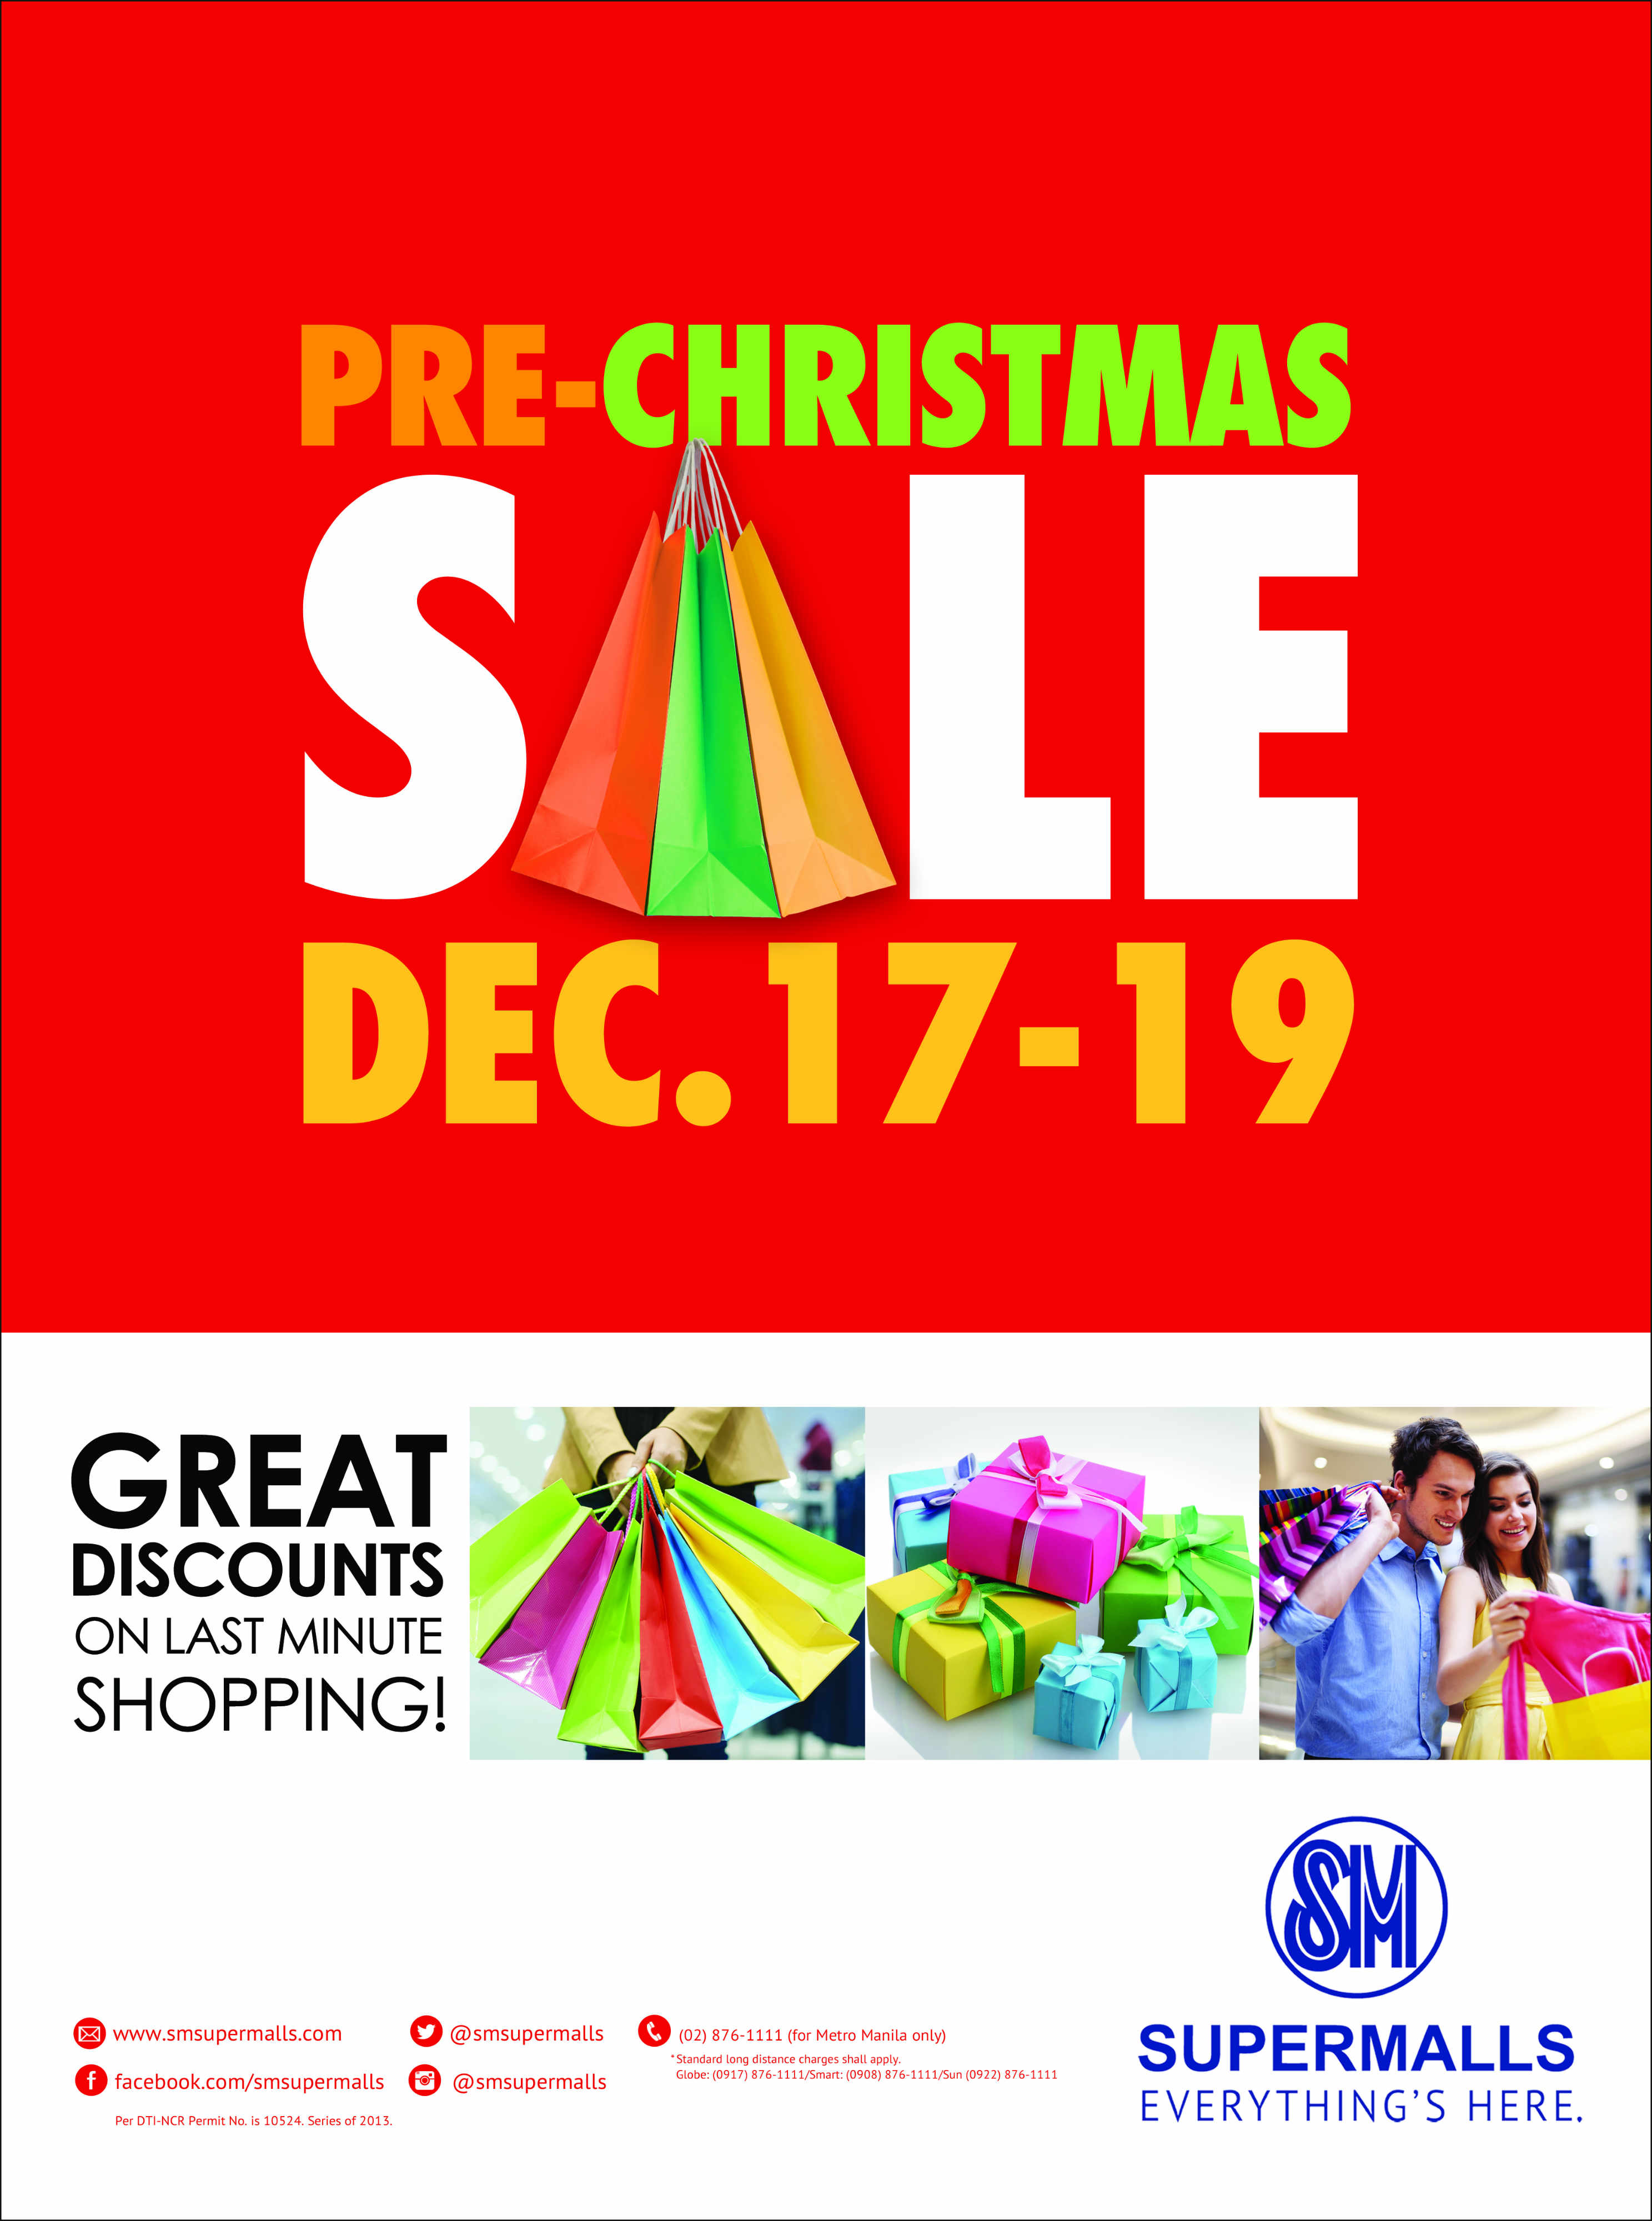 SM Supermalls Pre-Christmas Sale December 2013